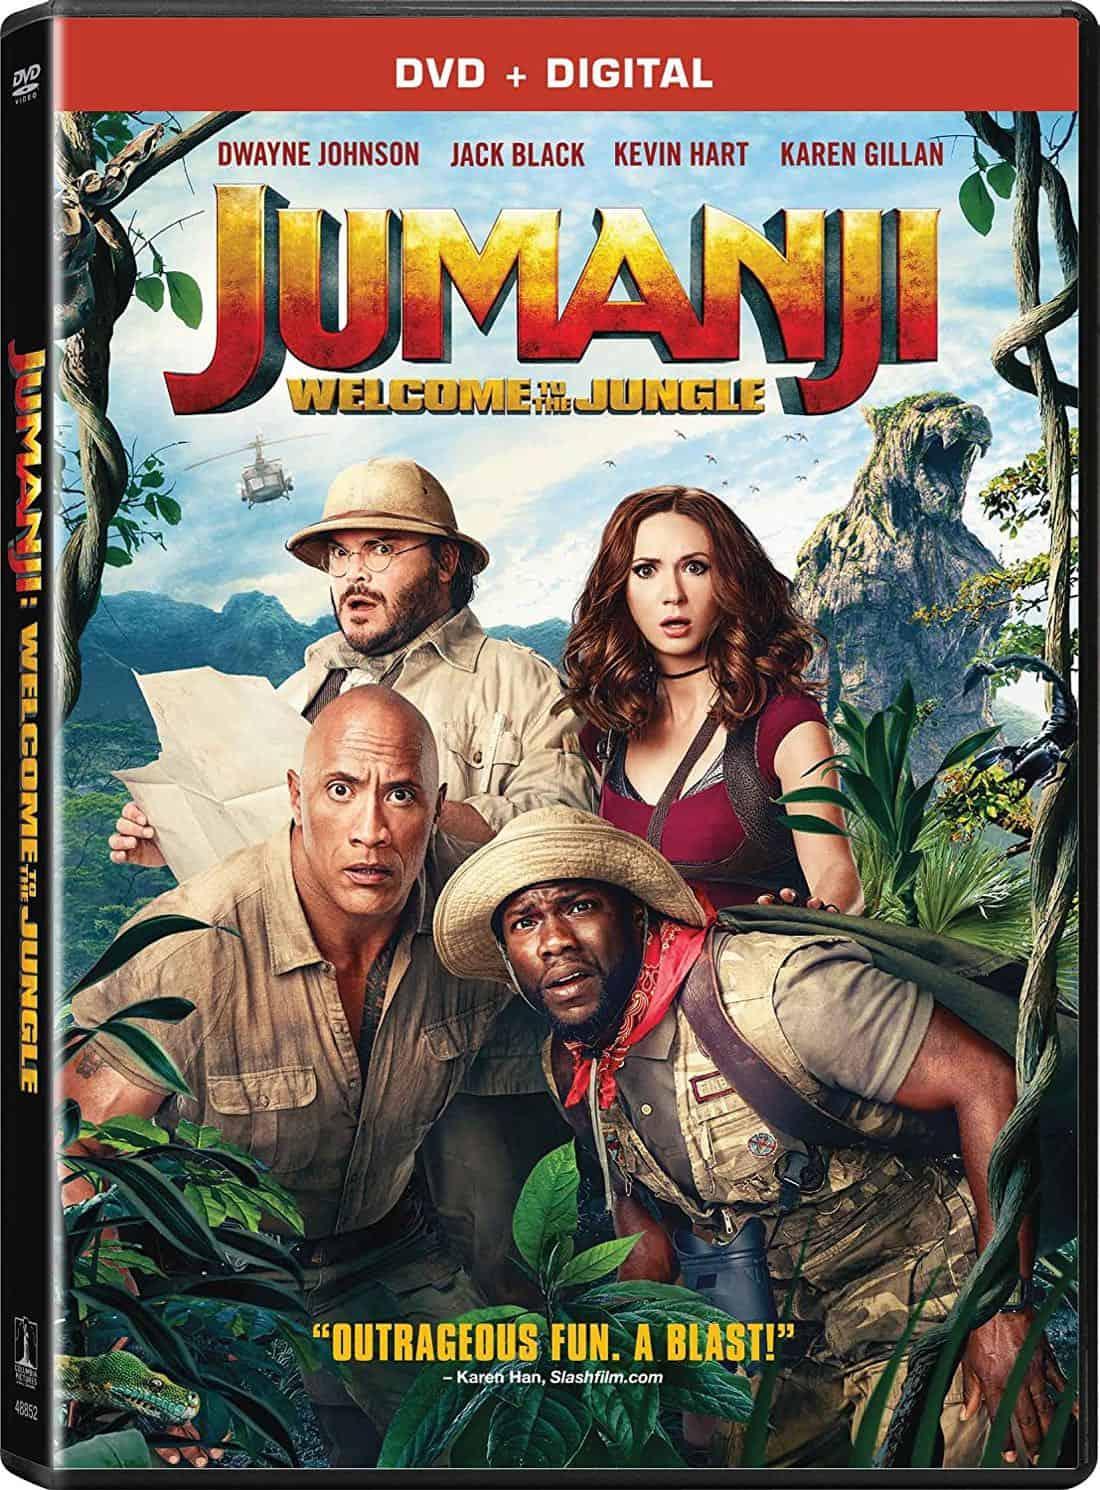 JUMANJI WELCOME TO THE JUNGLE DVD